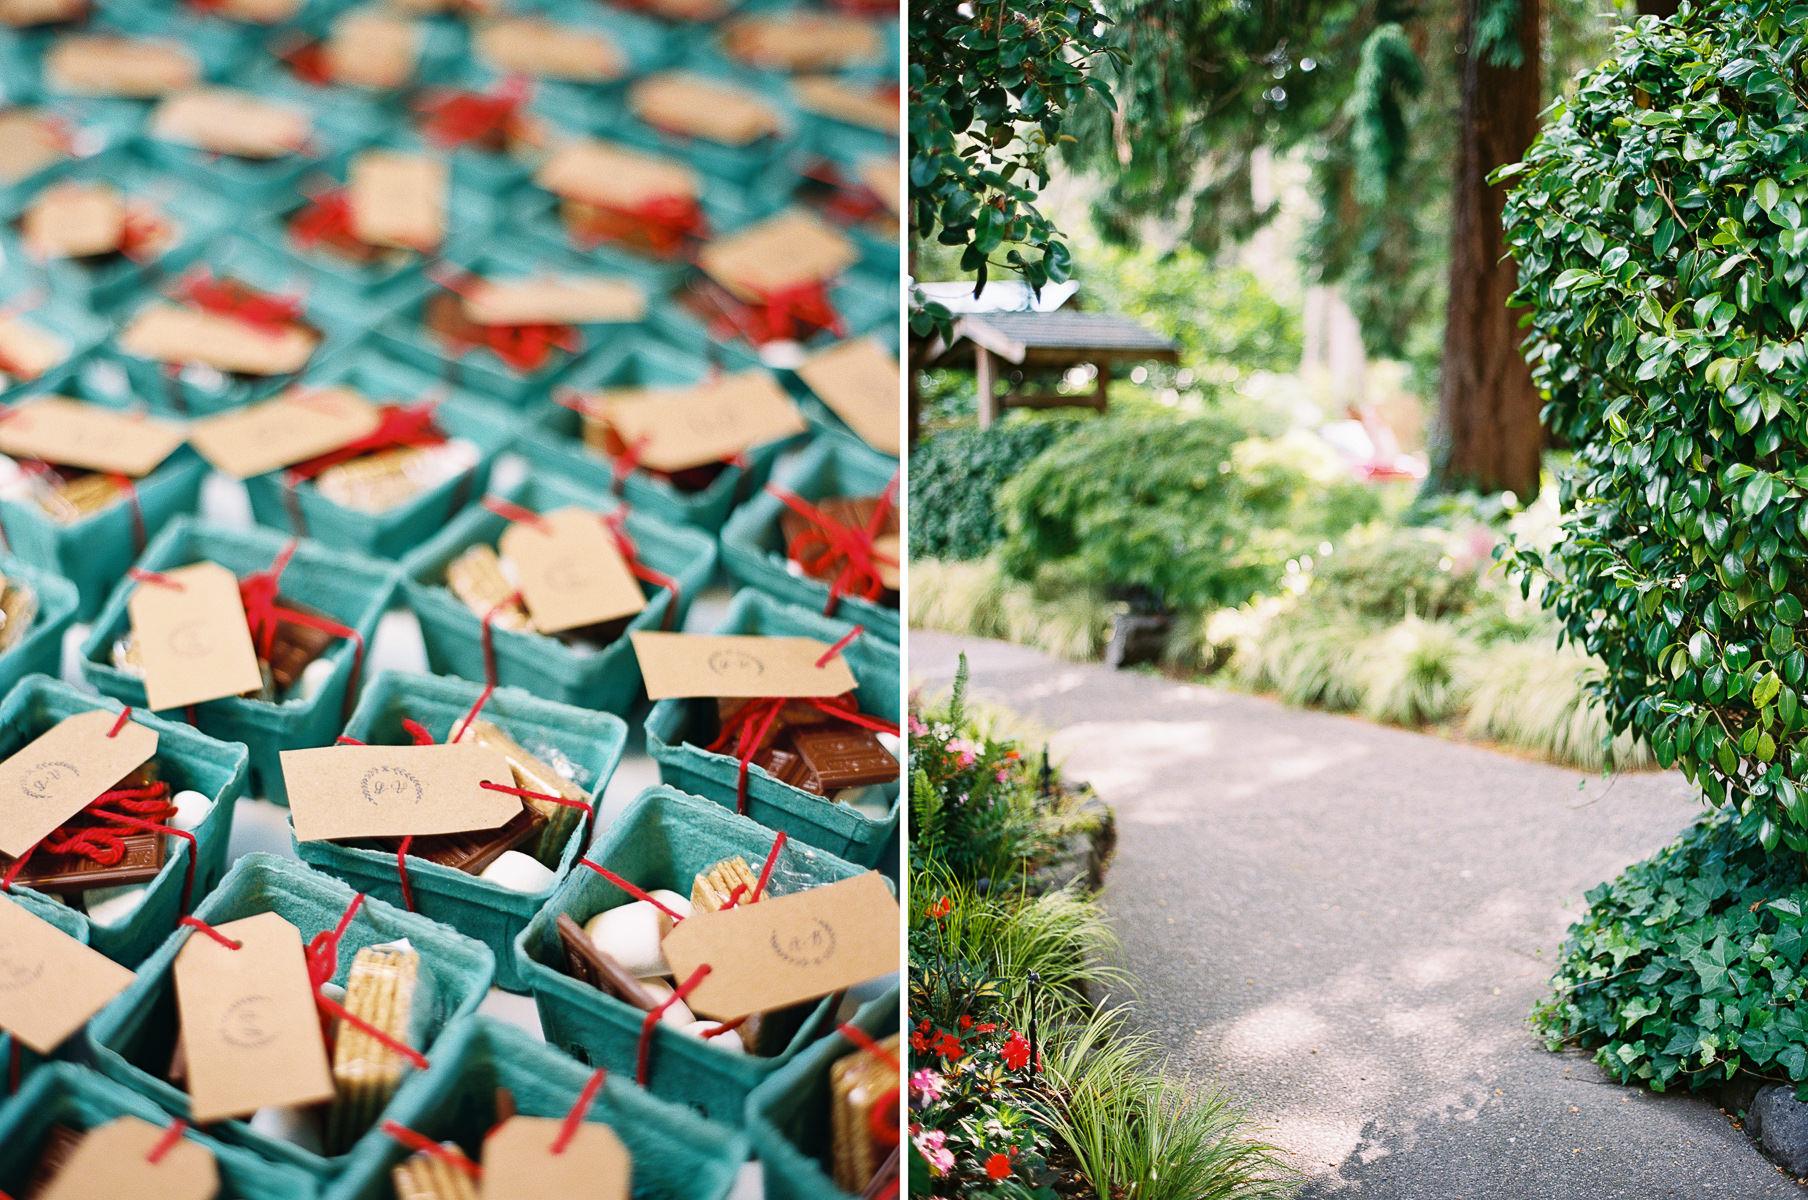 S'mores wedding favors at an Elegant Kiana Lodge Wedding